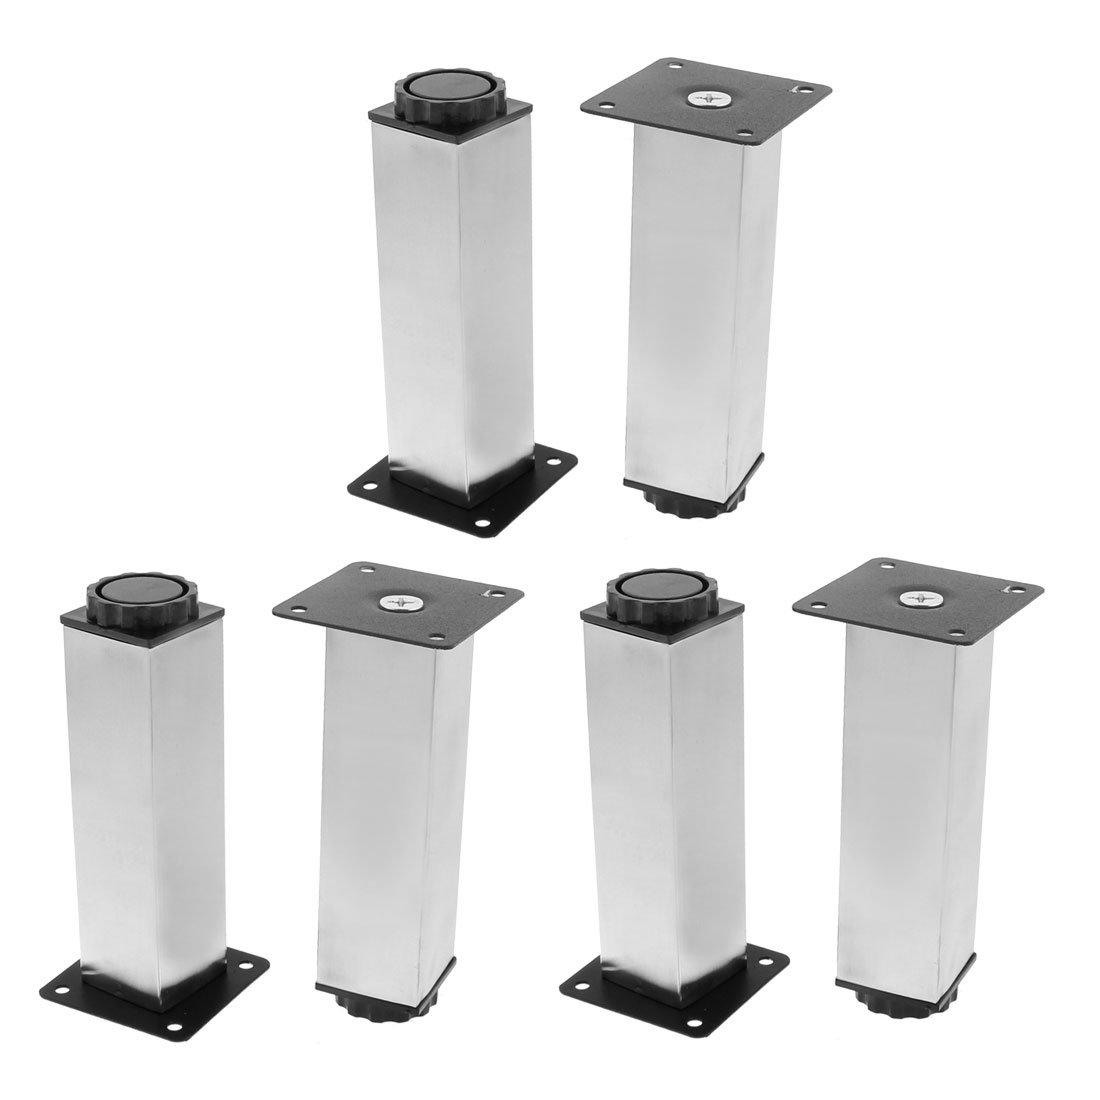 uxcell Kitchen Cabinet Support 38mm x 150mm Adjustable Plinth Leg 6pcs